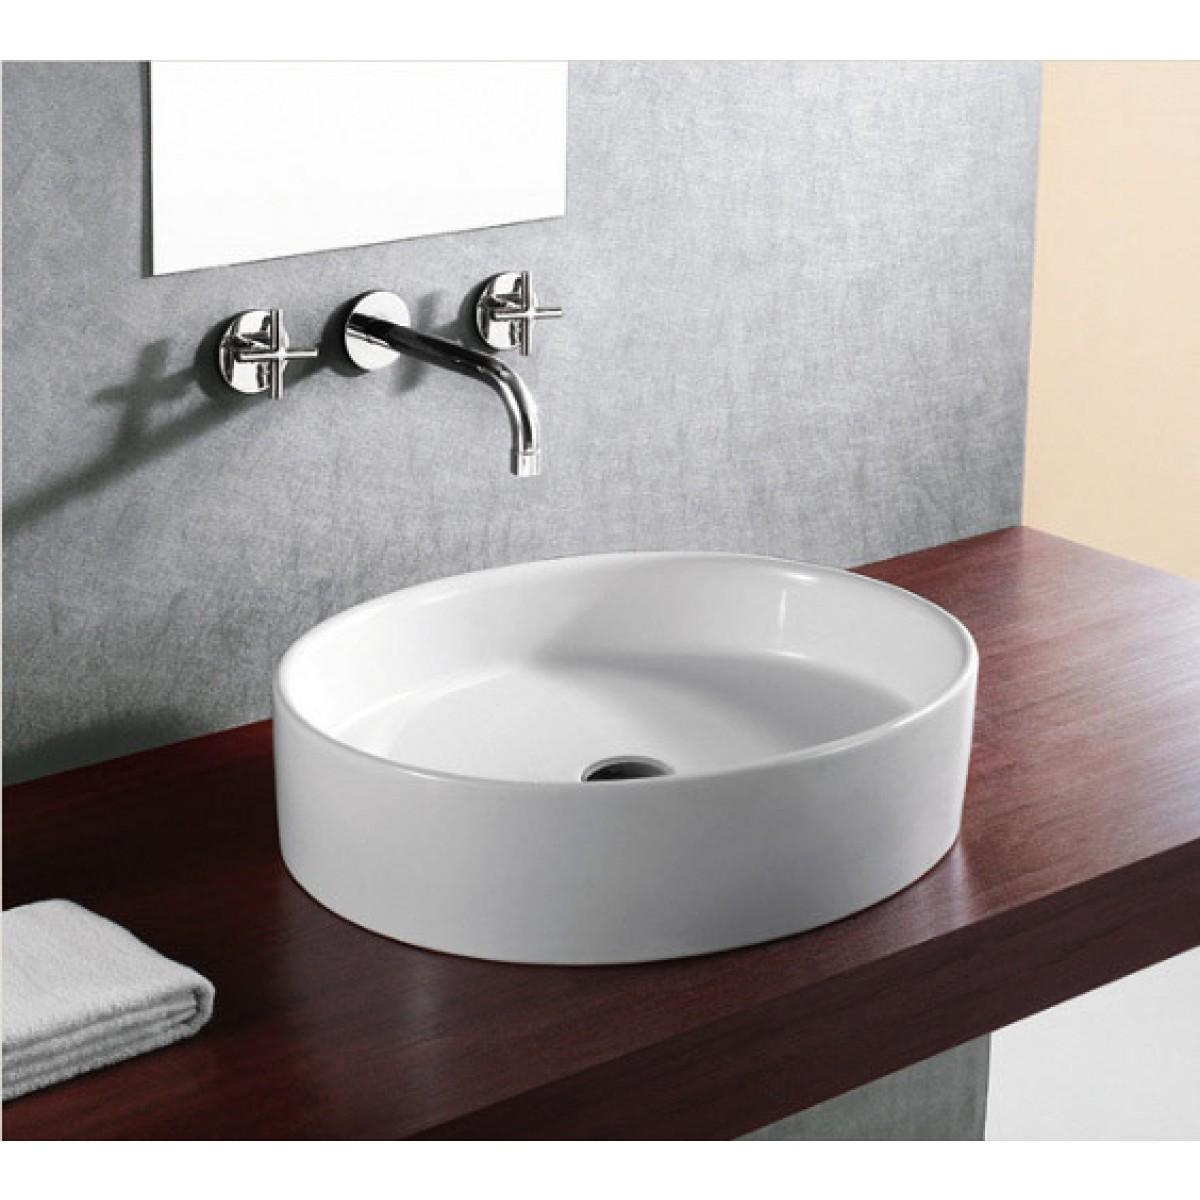 European Style Oval Shape Porcelain Ceramic Bathroom